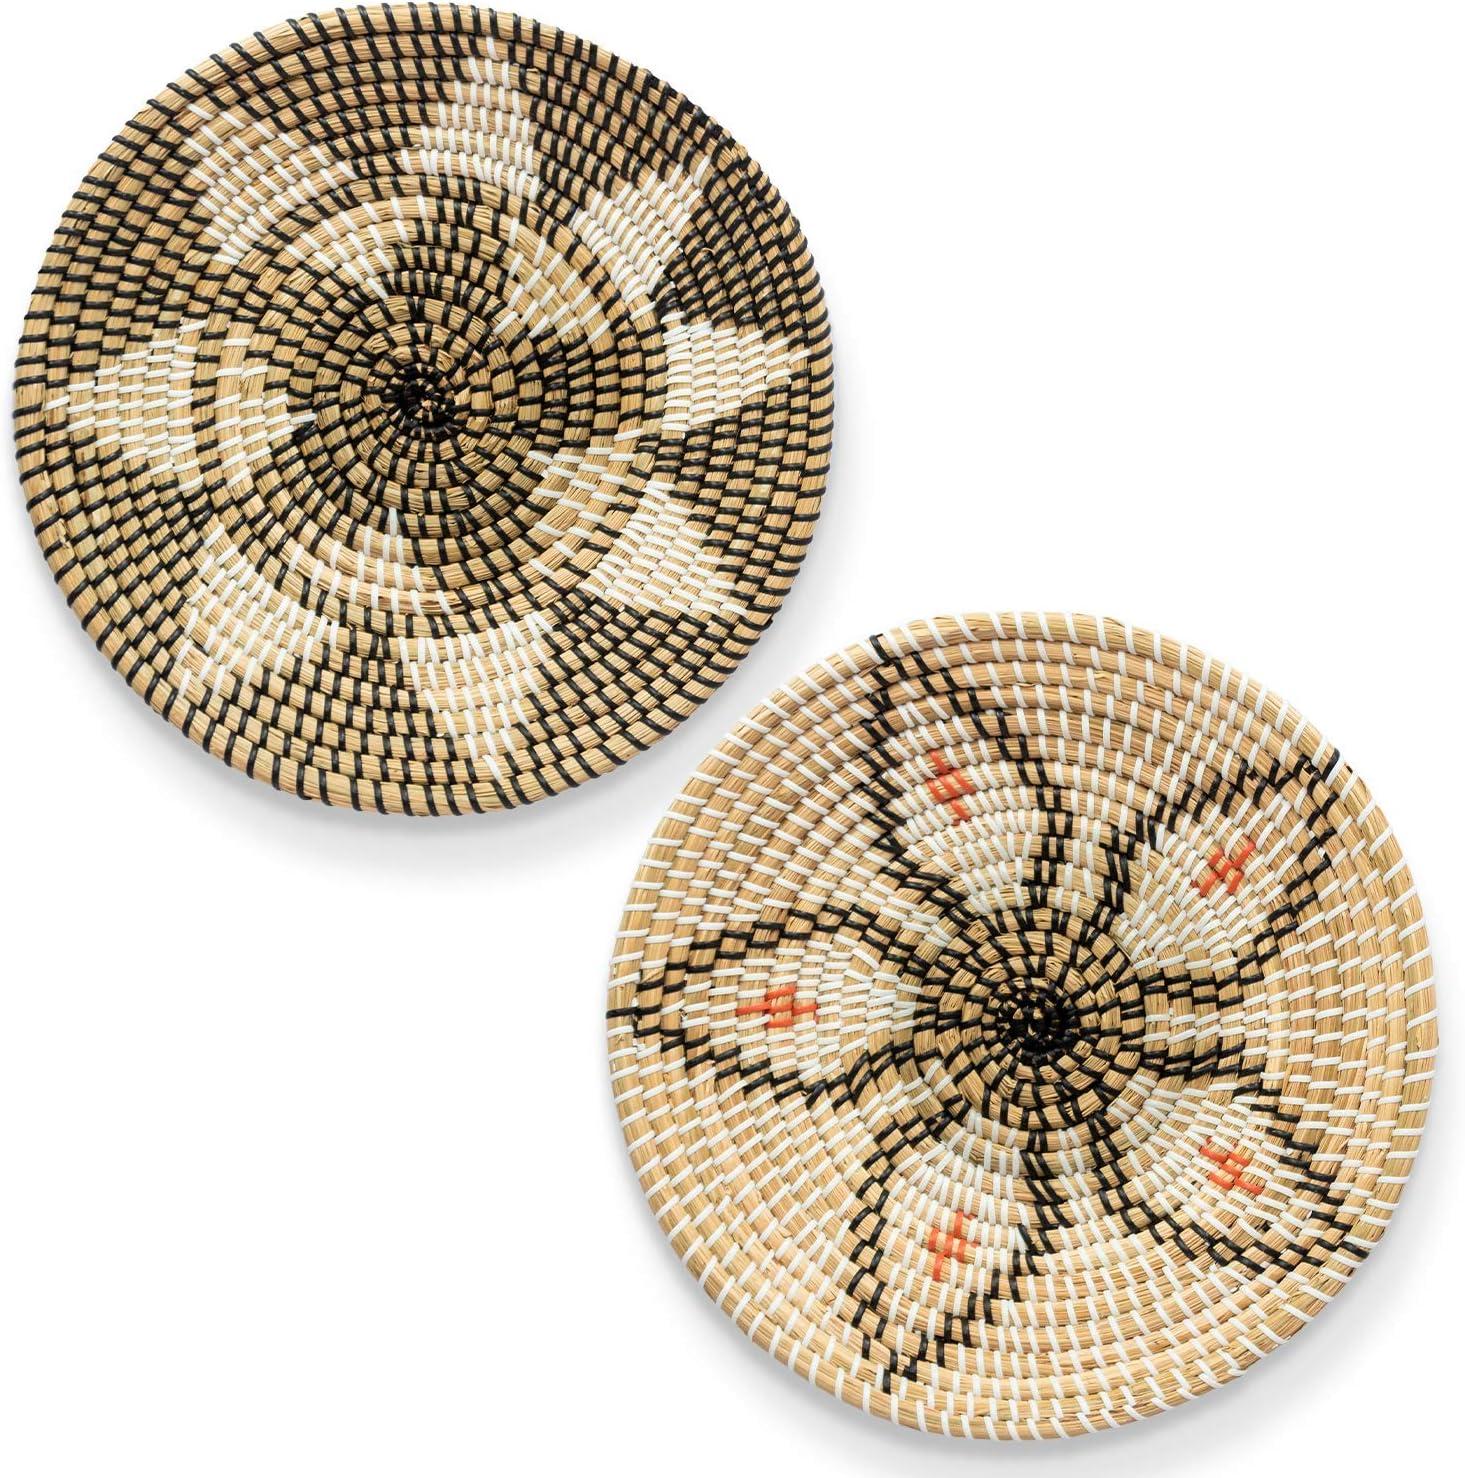 HNCmua Genuine Free Shipping Woven Tampa Mall Basket Wall Decor - Wicker Rattan Set